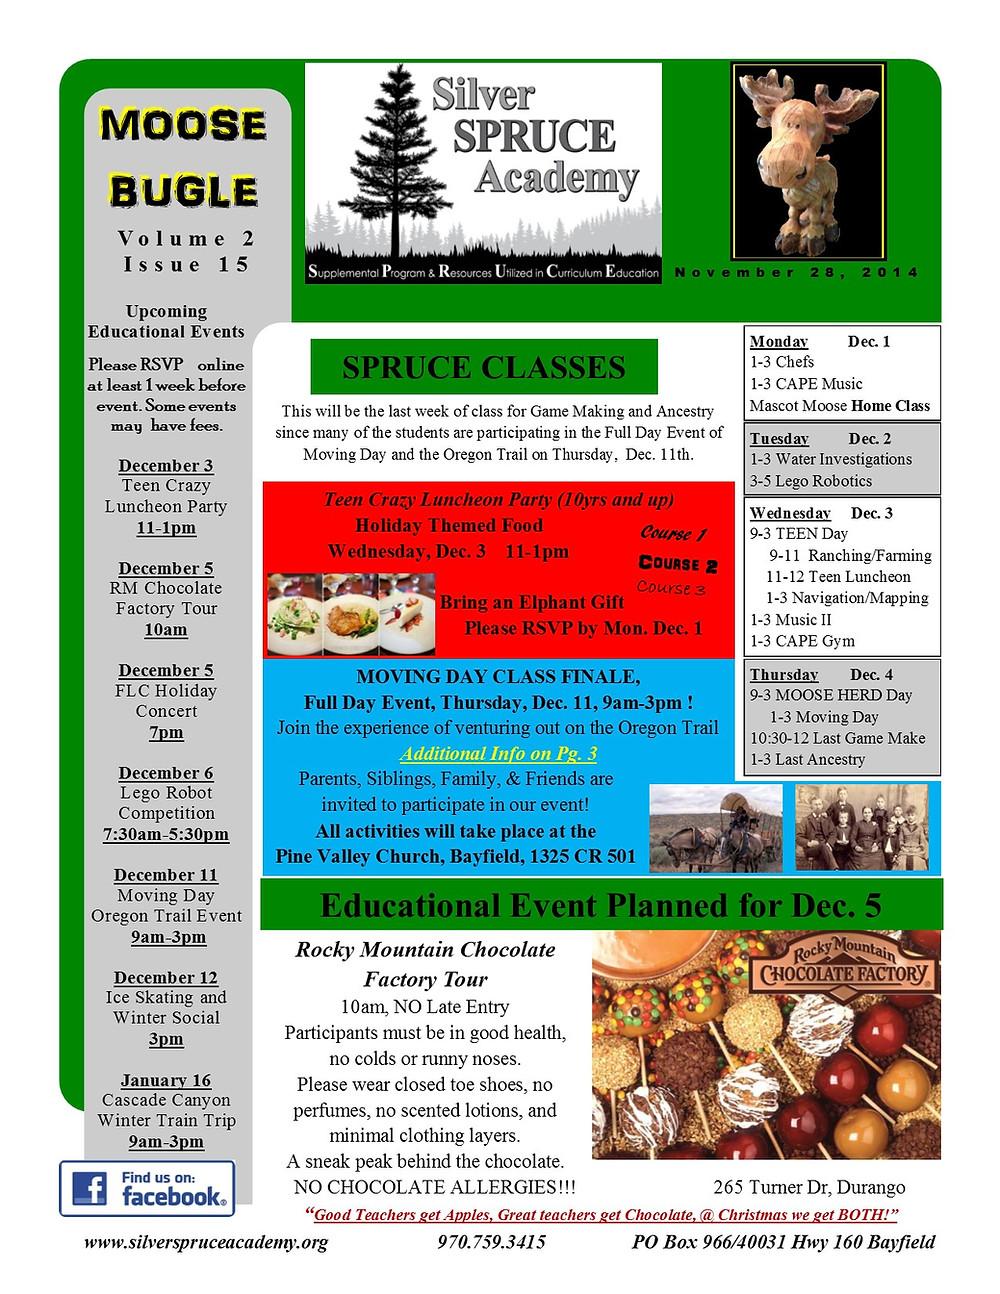 Moose Bugle 11-28-14 Page 1.jpg